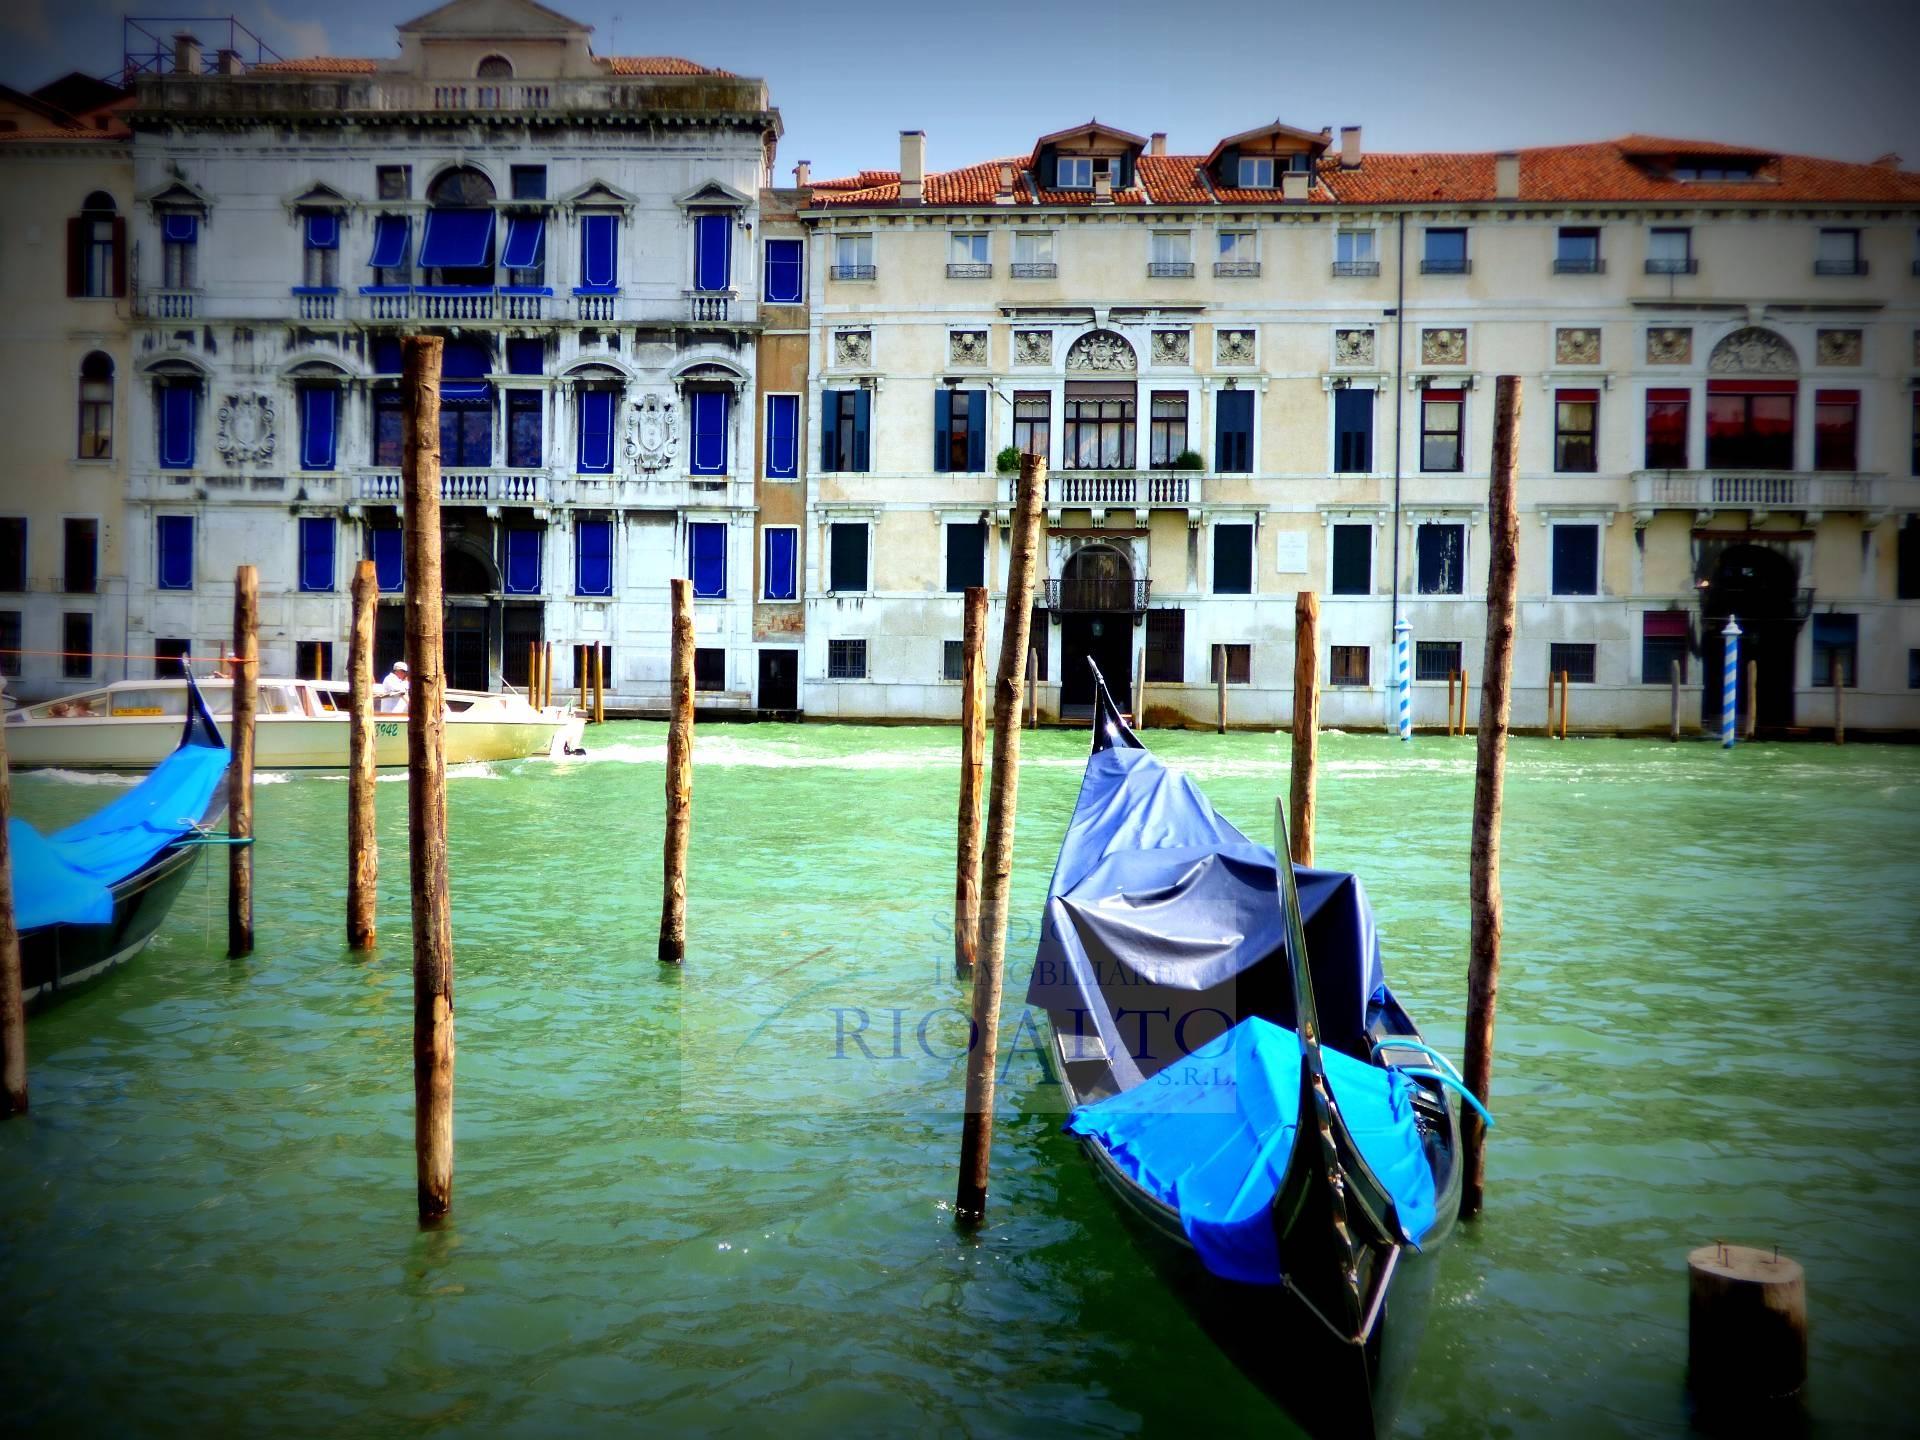 Luxury Property for Sale<br/>Venezia - San Polo